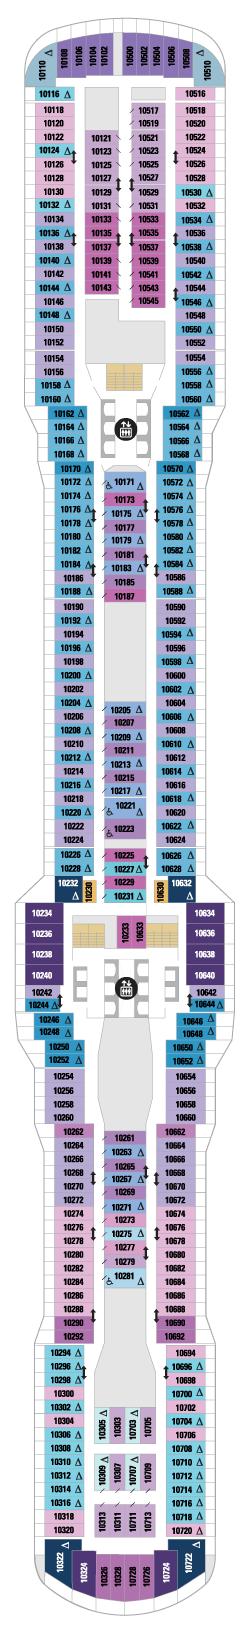 Spectrum of the Seas Deck 10